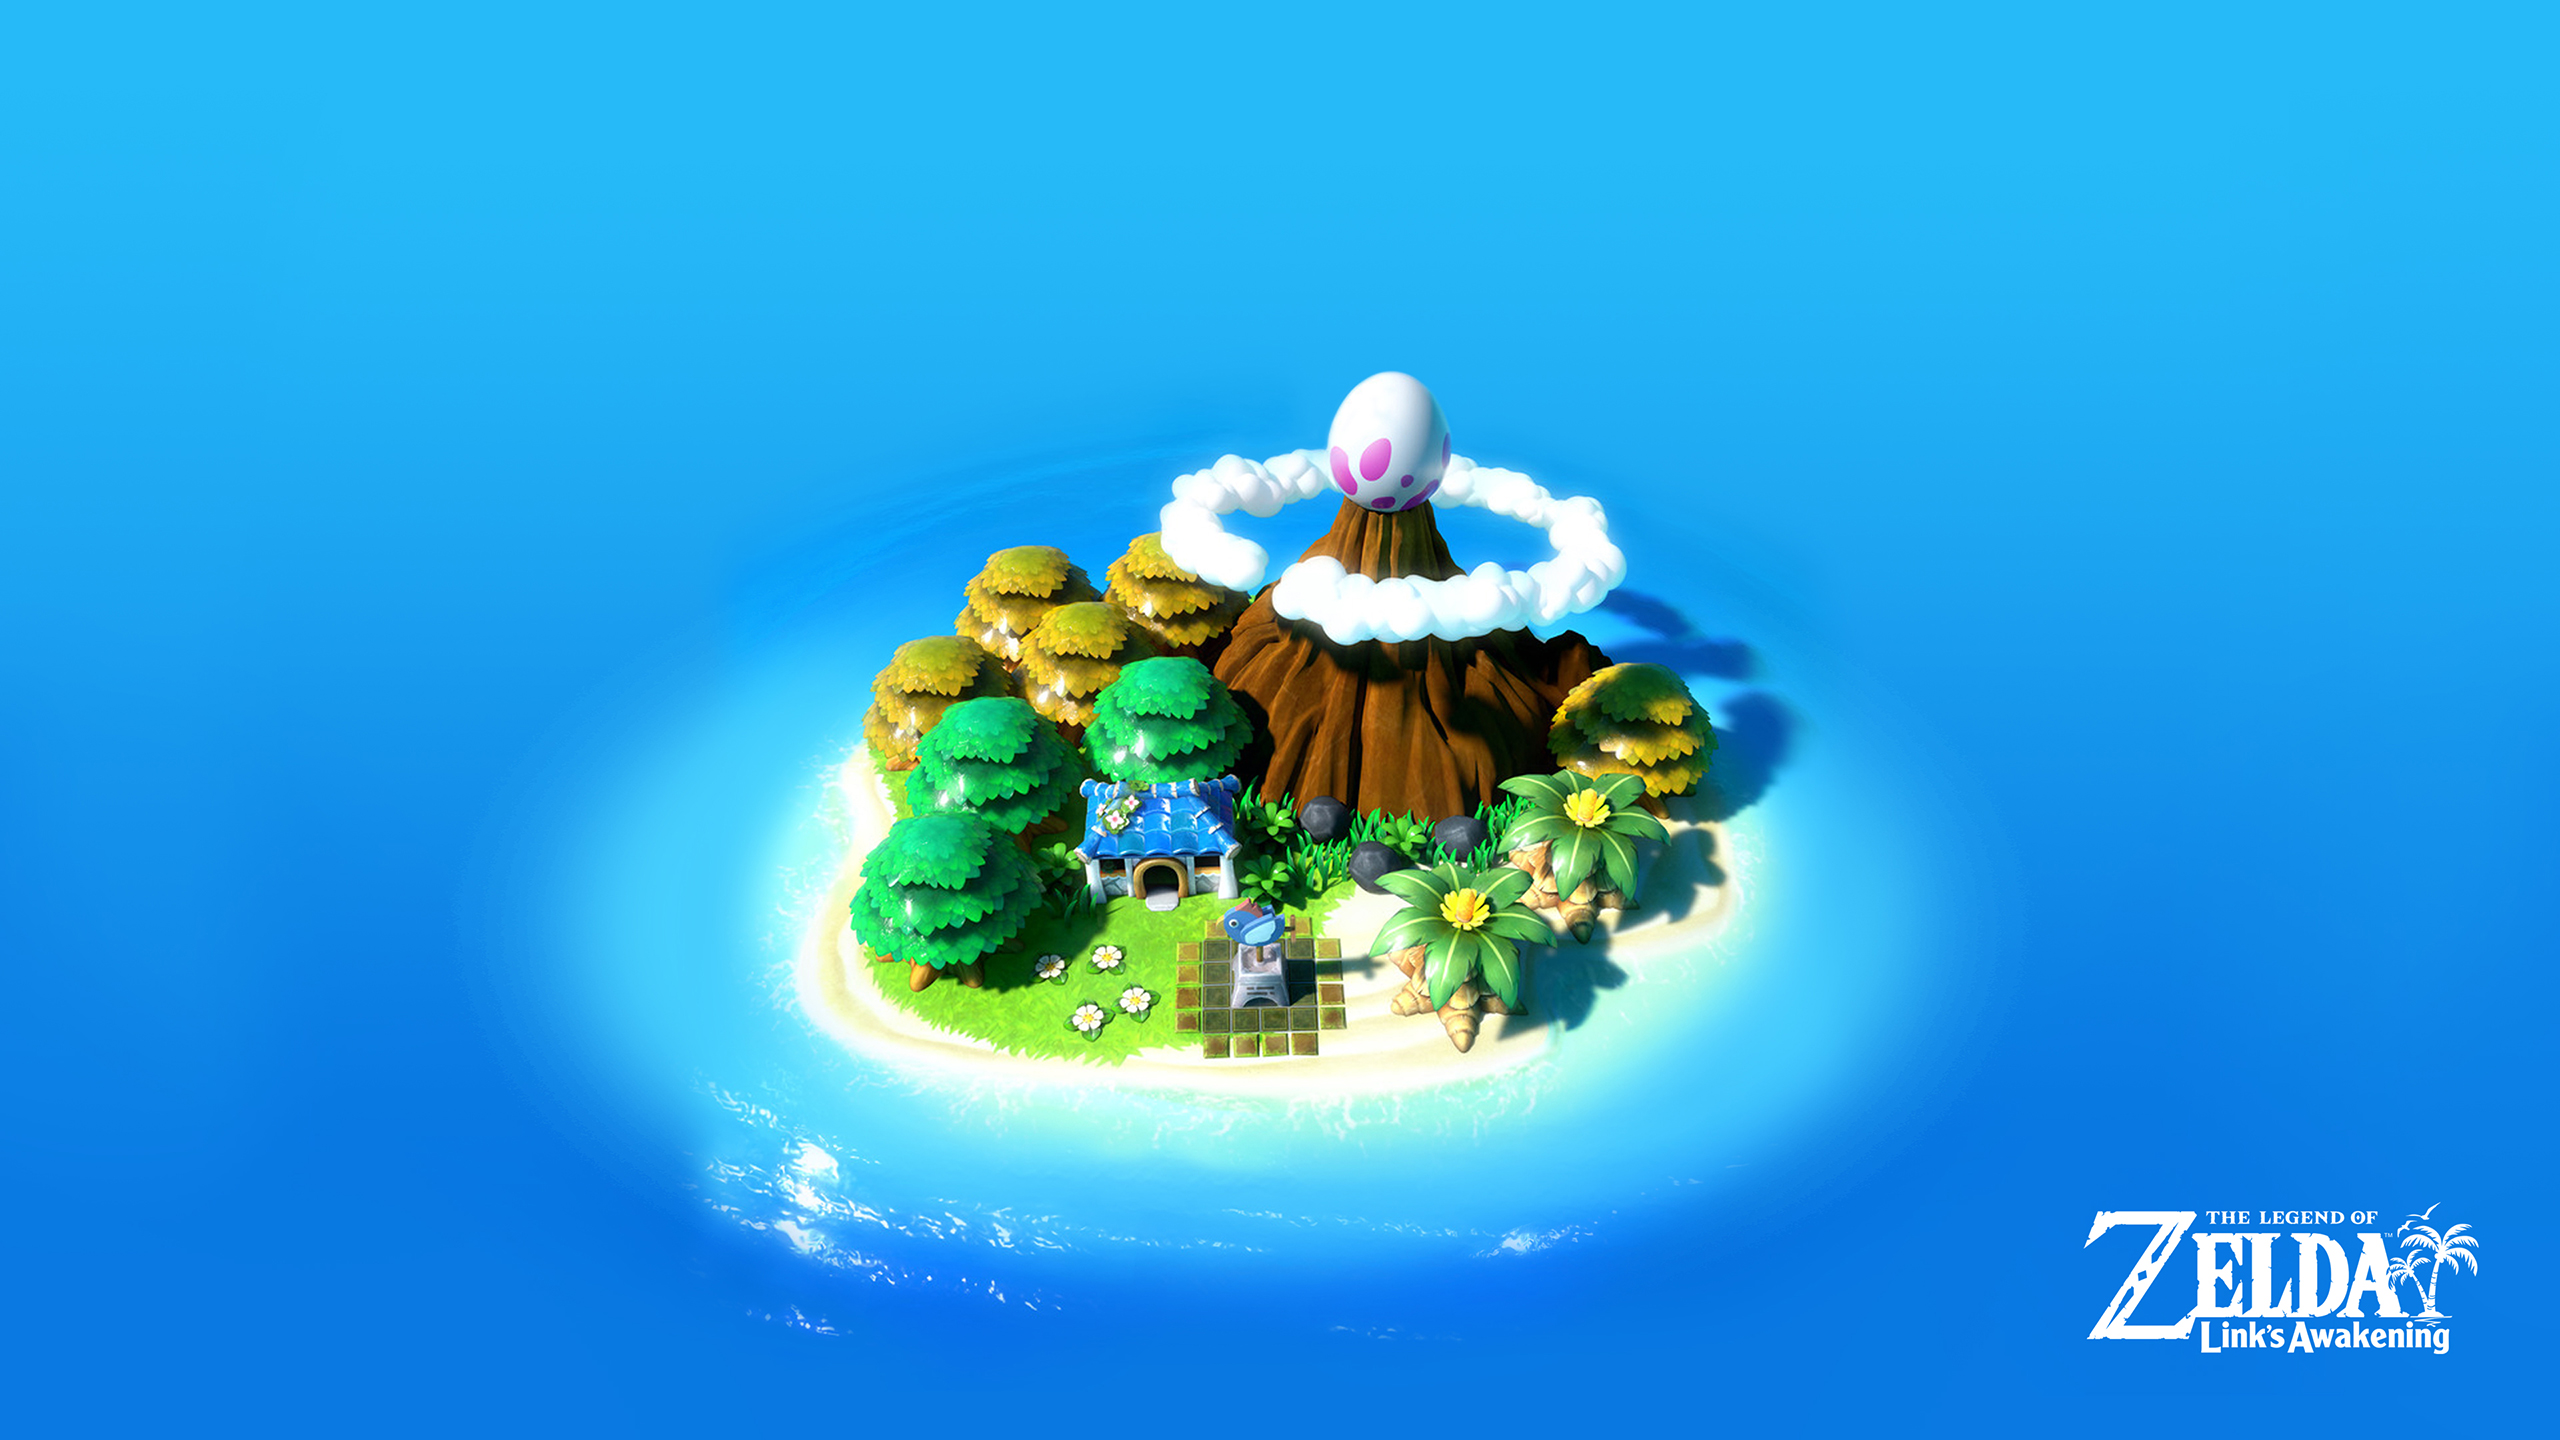 Zelda Linksawakening Island 2560x1440 Cat With Monocle